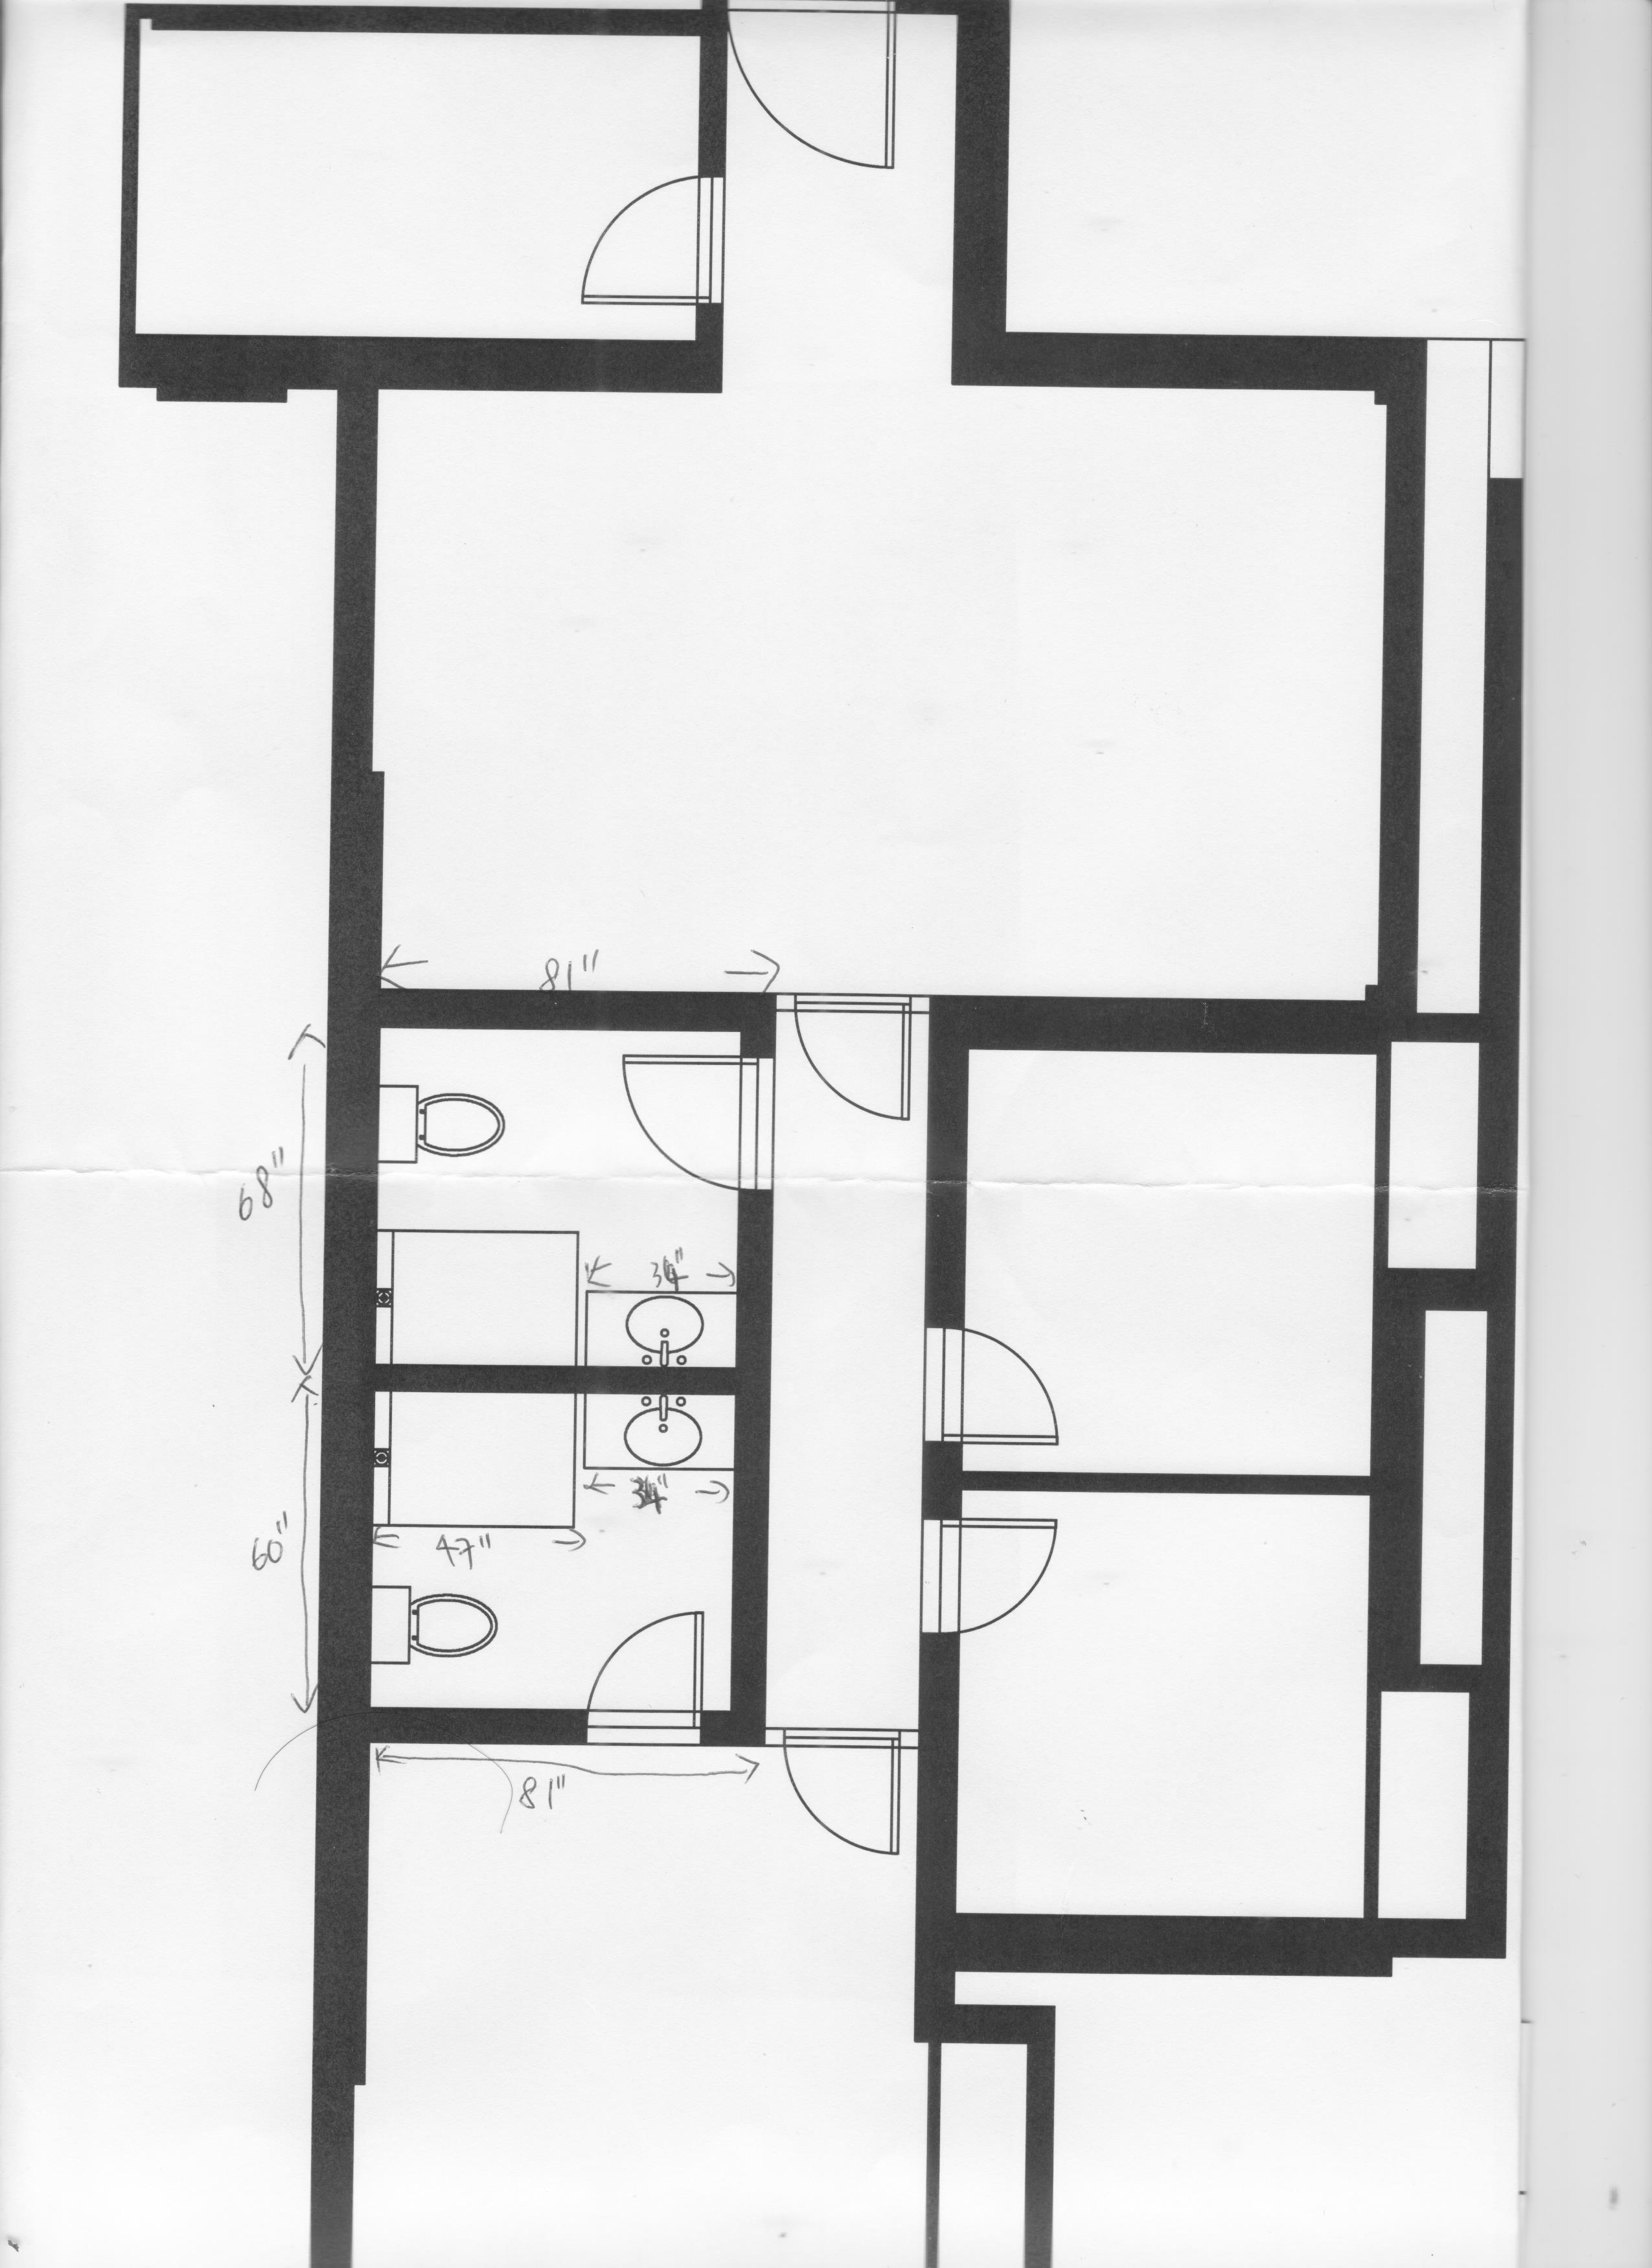 bid_deco_floorplan_1473132598.jpg